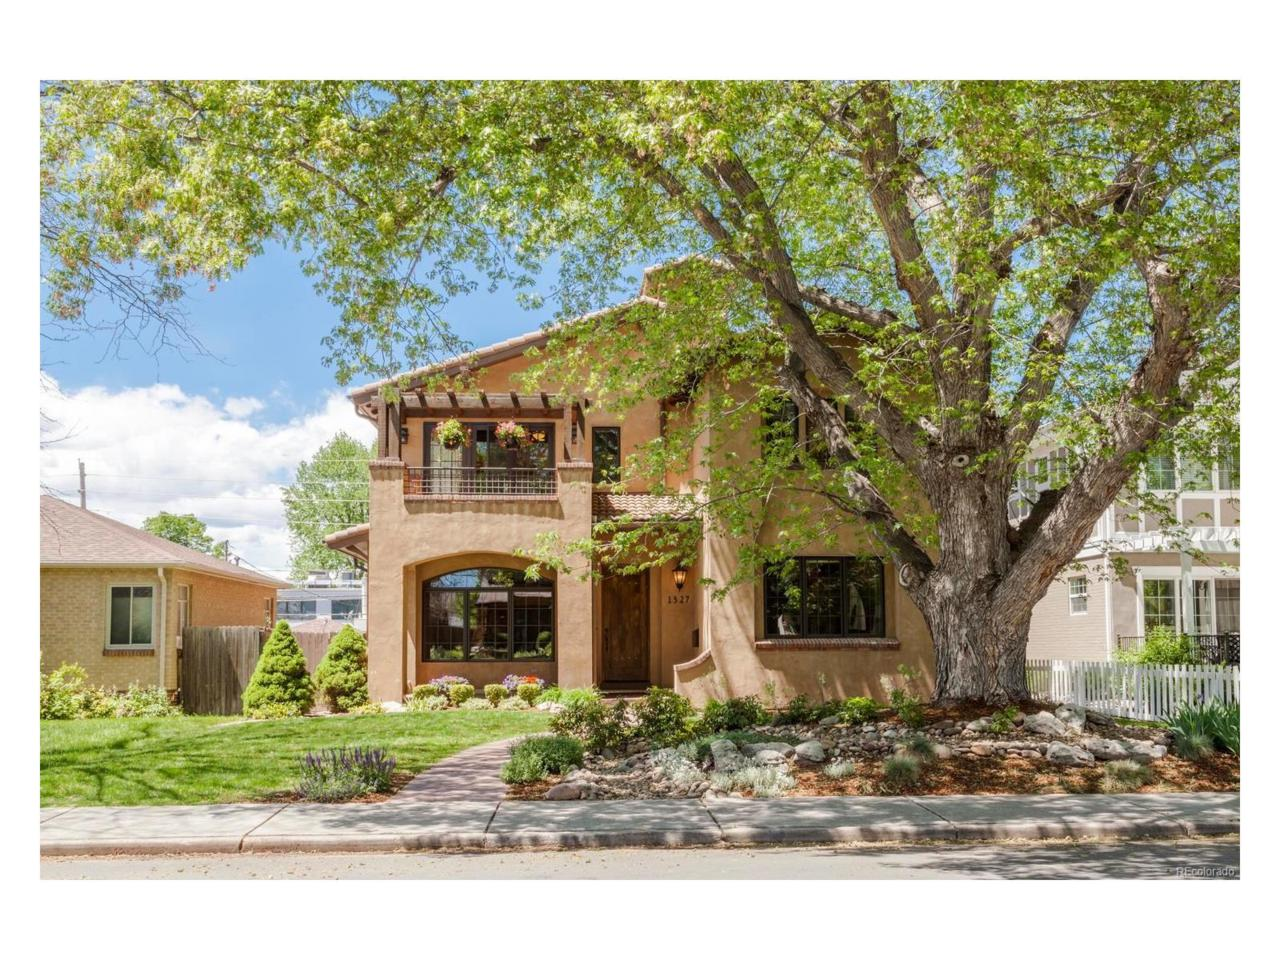 1327 S Saint Paul Street, Denver, CO 80210 (MLS #7434958) :: 8z Real Estate